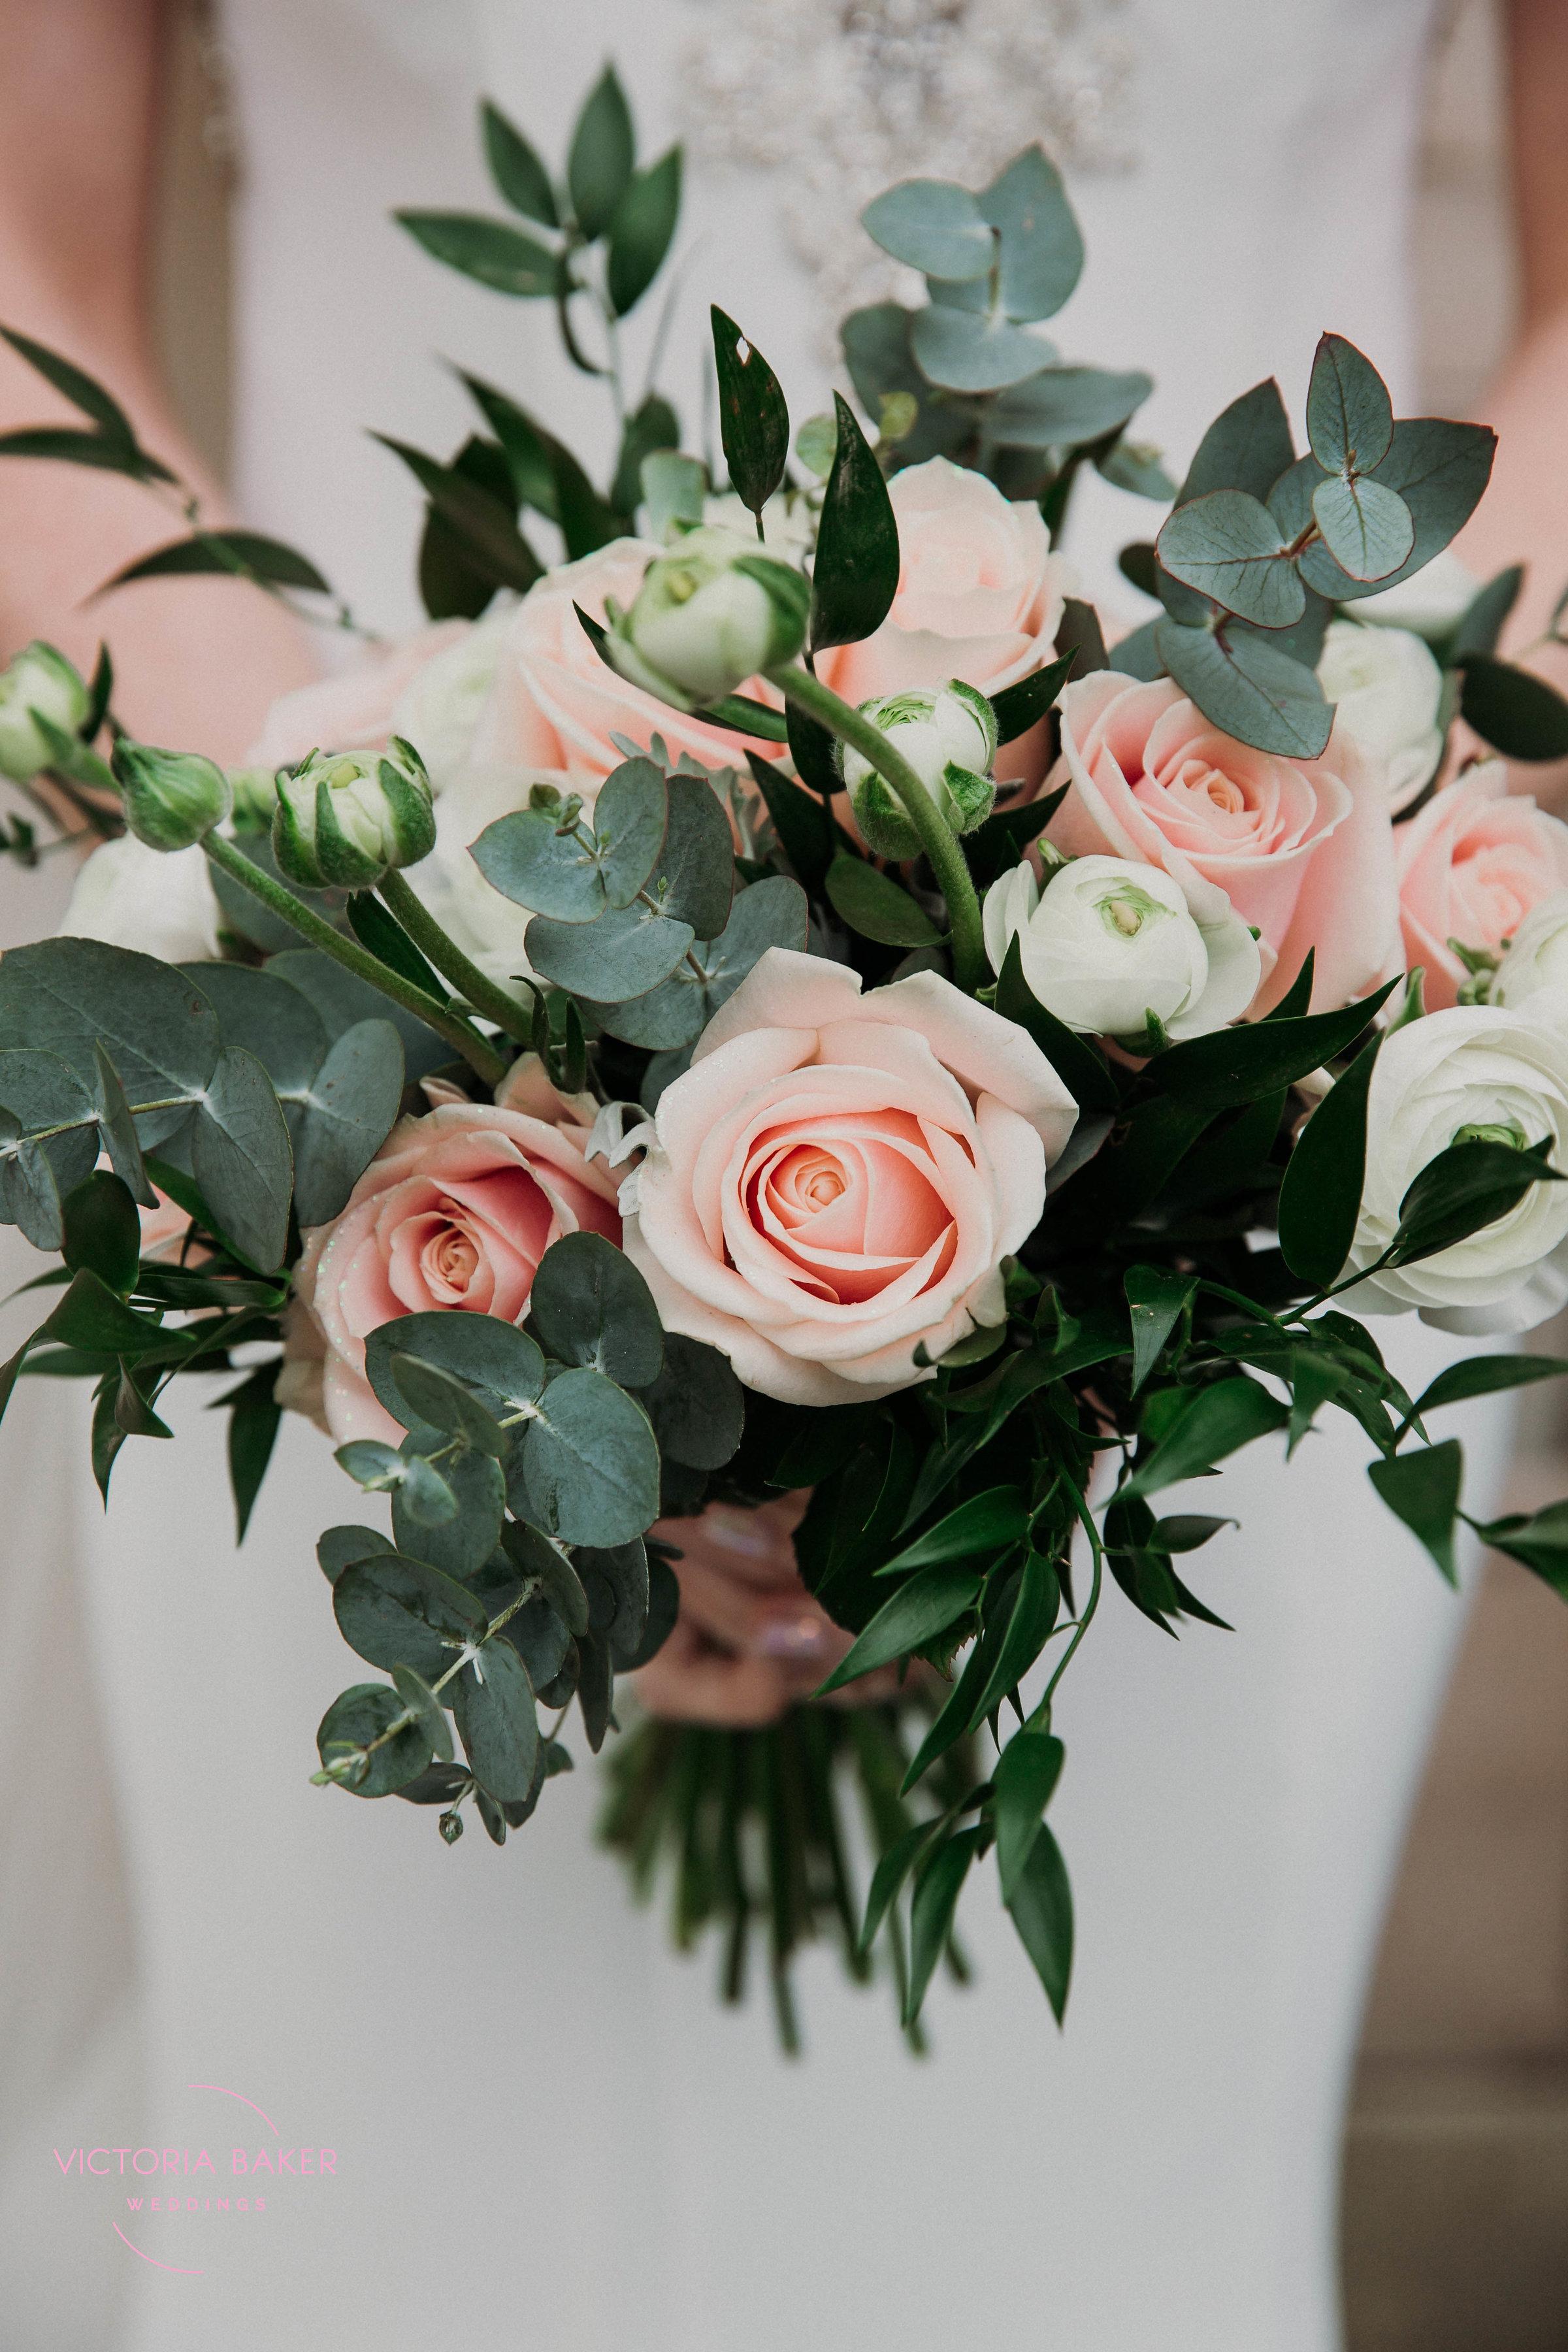 Pink and white wedding flowers harrogate